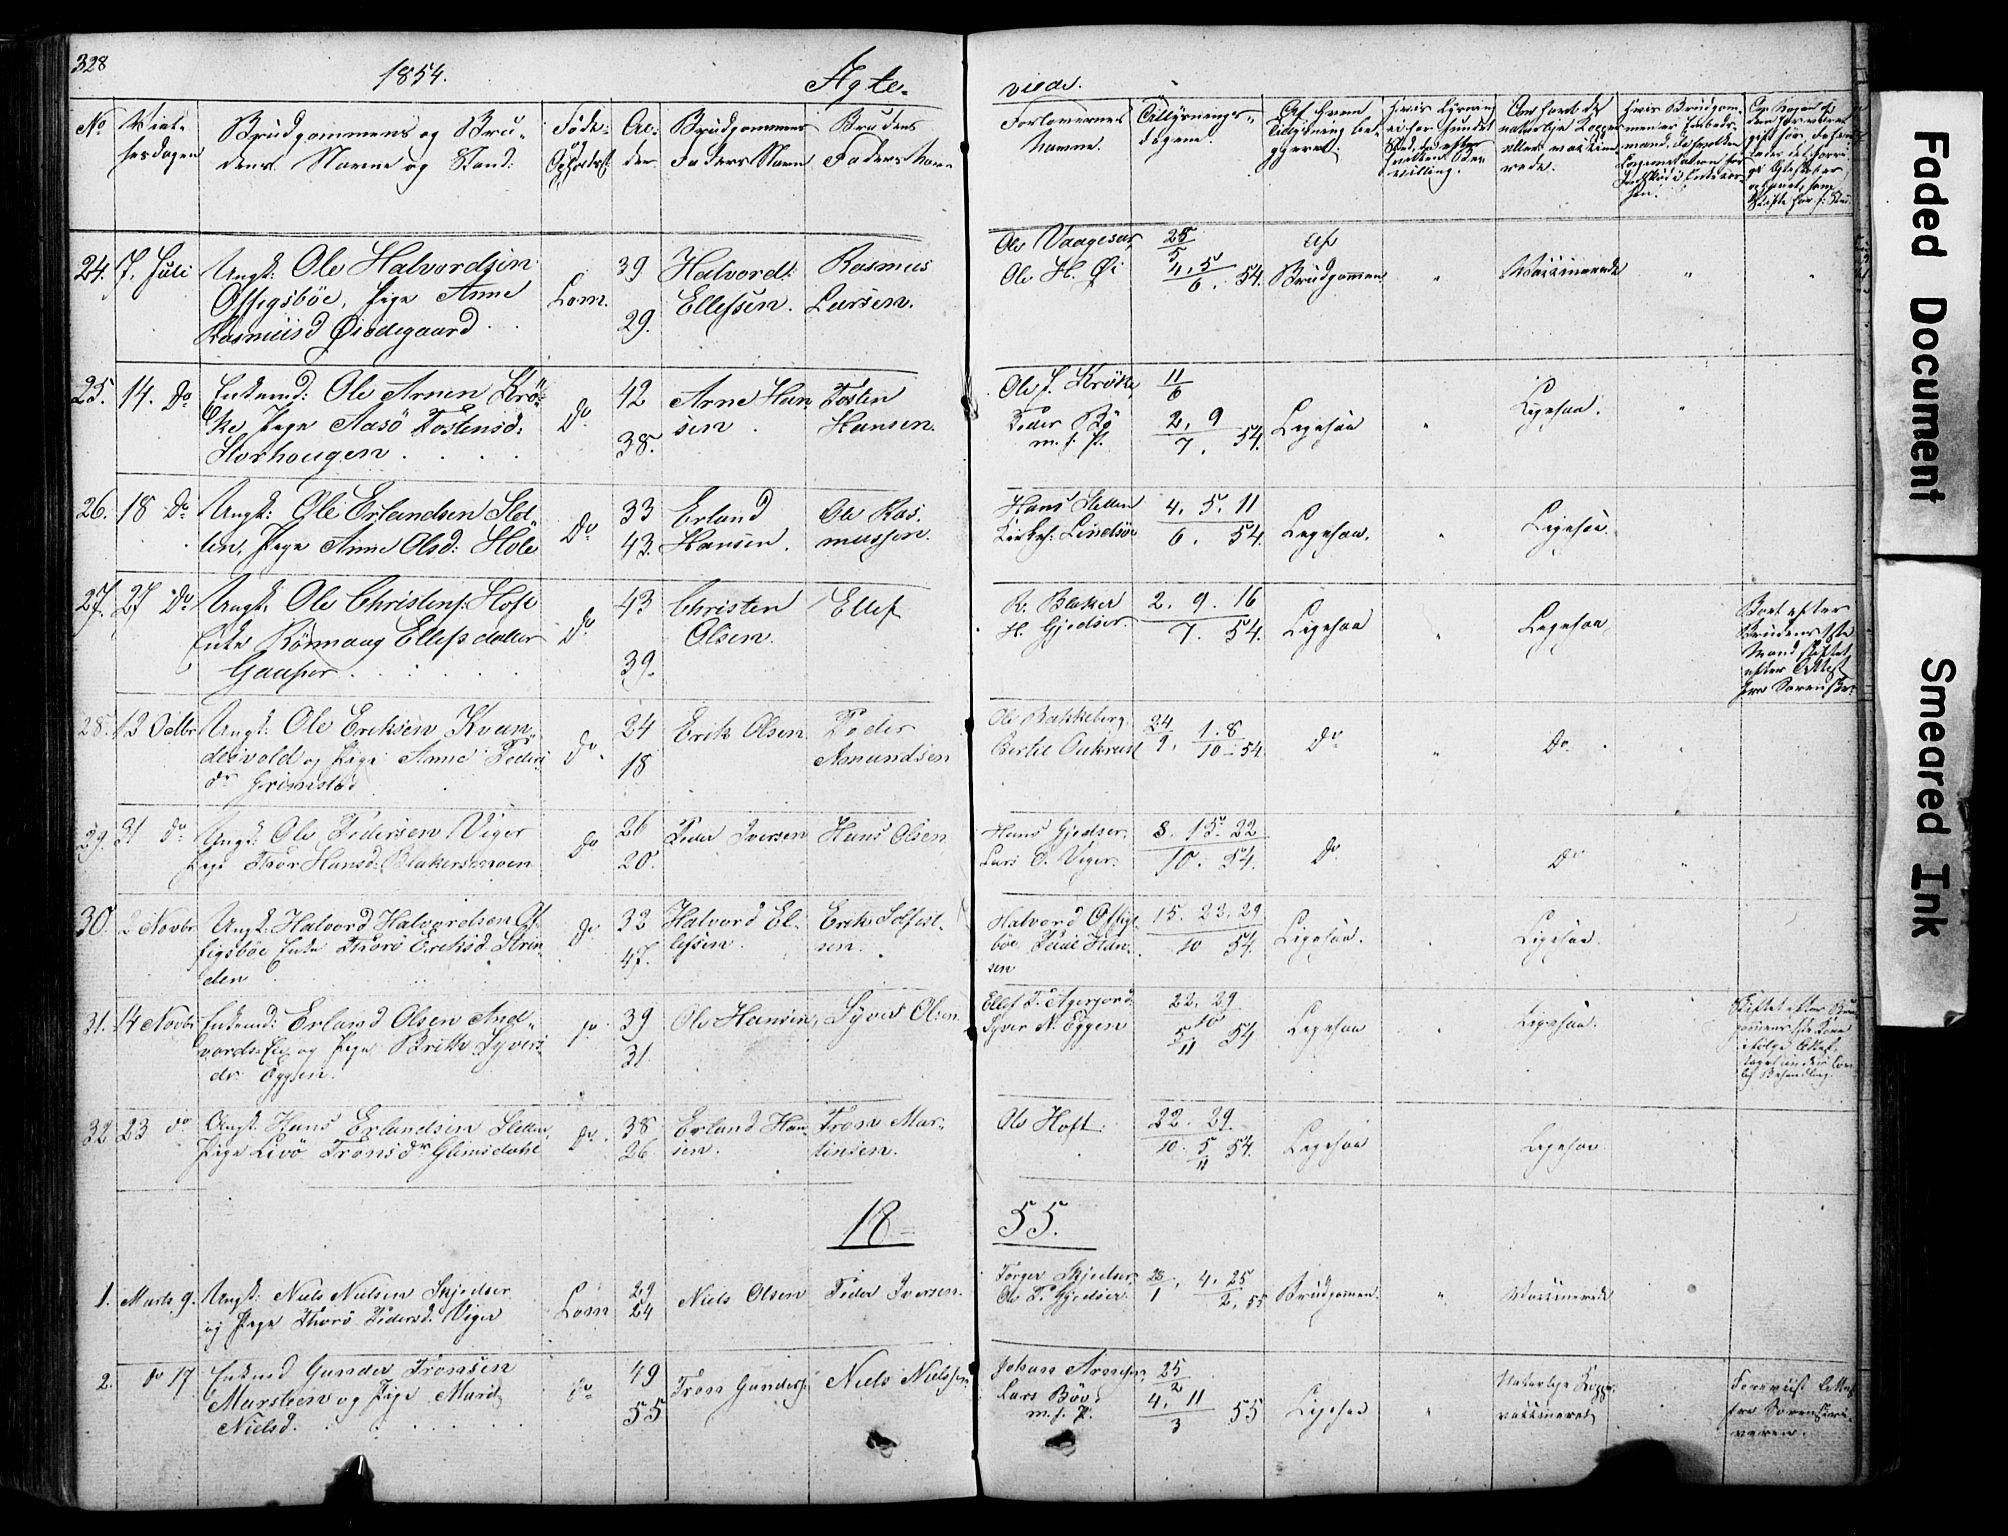 SAH, Lom prestekontor, L/L0012: Parish register (copy) no. 12, 1845-1873, p. 328-329